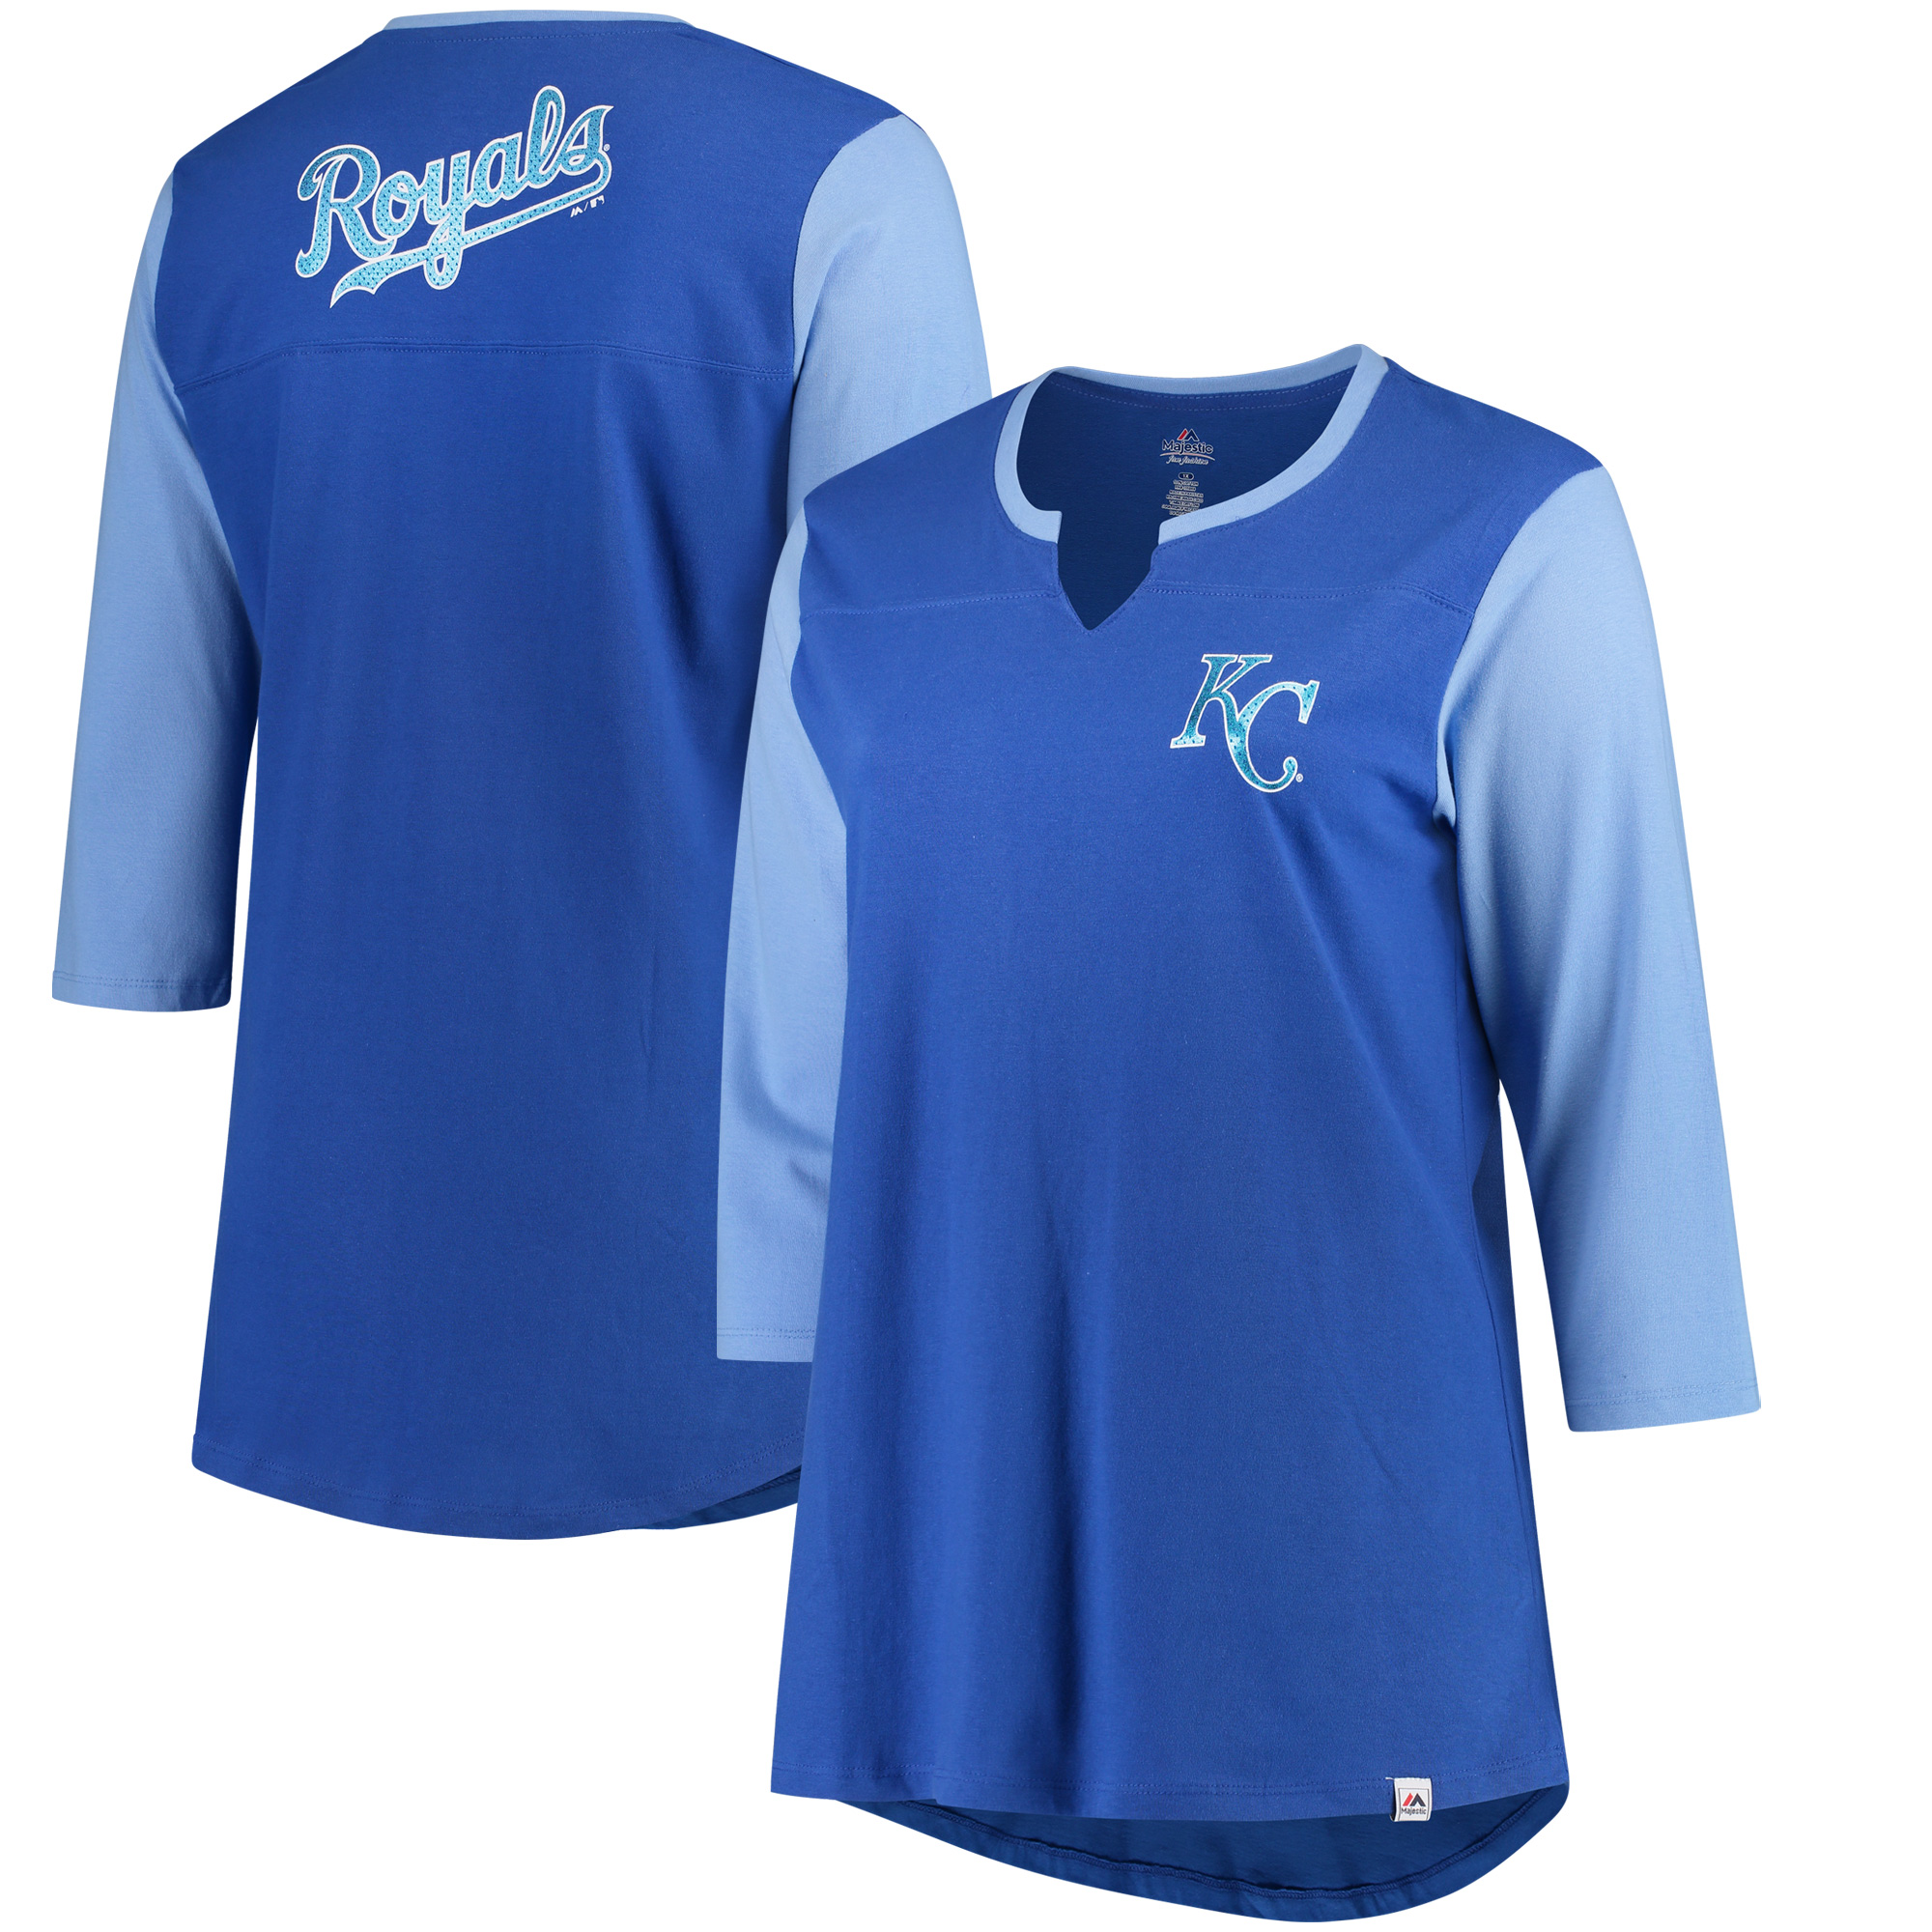 Kansas City Royals Majestic Women's Plus Size Above Average 3/4-Sleeve Raglan T-Shirt - Royal/Light Blue